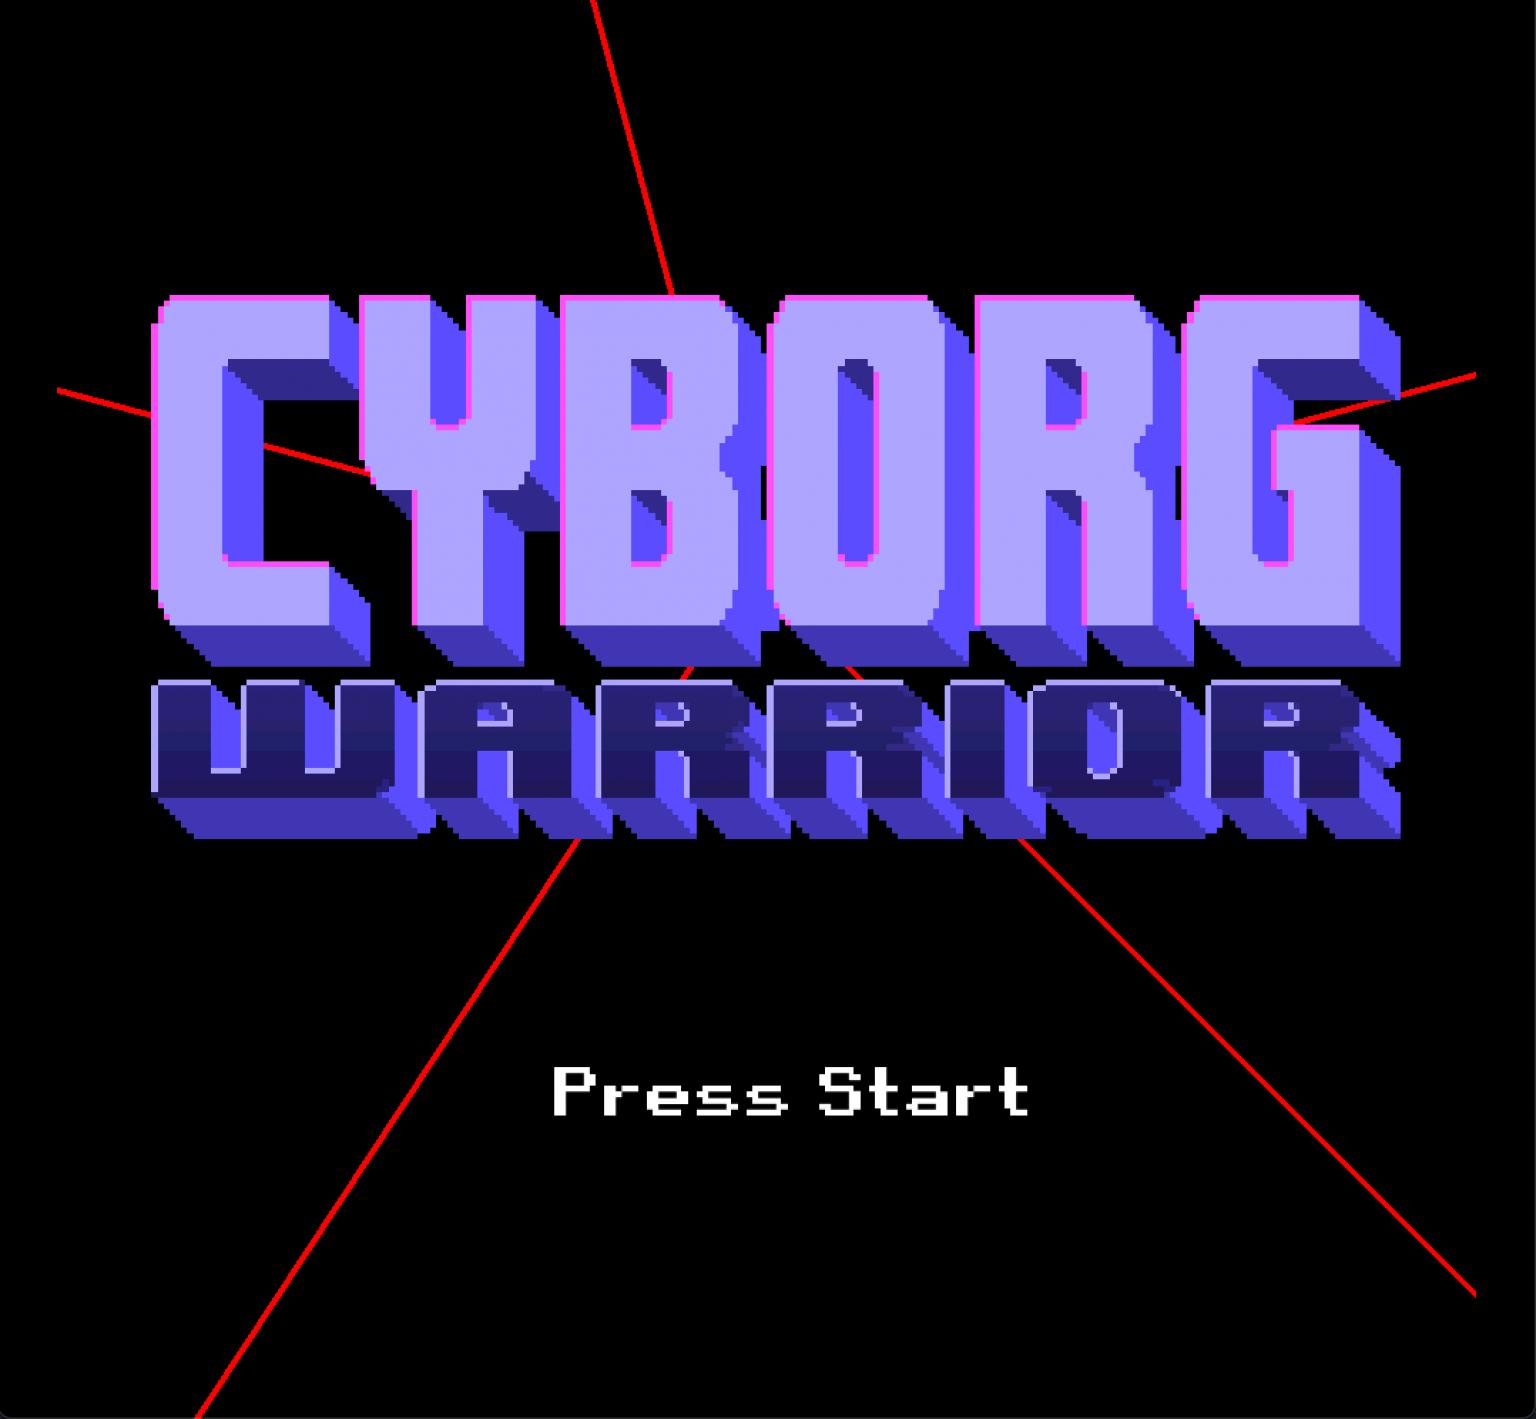 Cyborg Warrior title screen